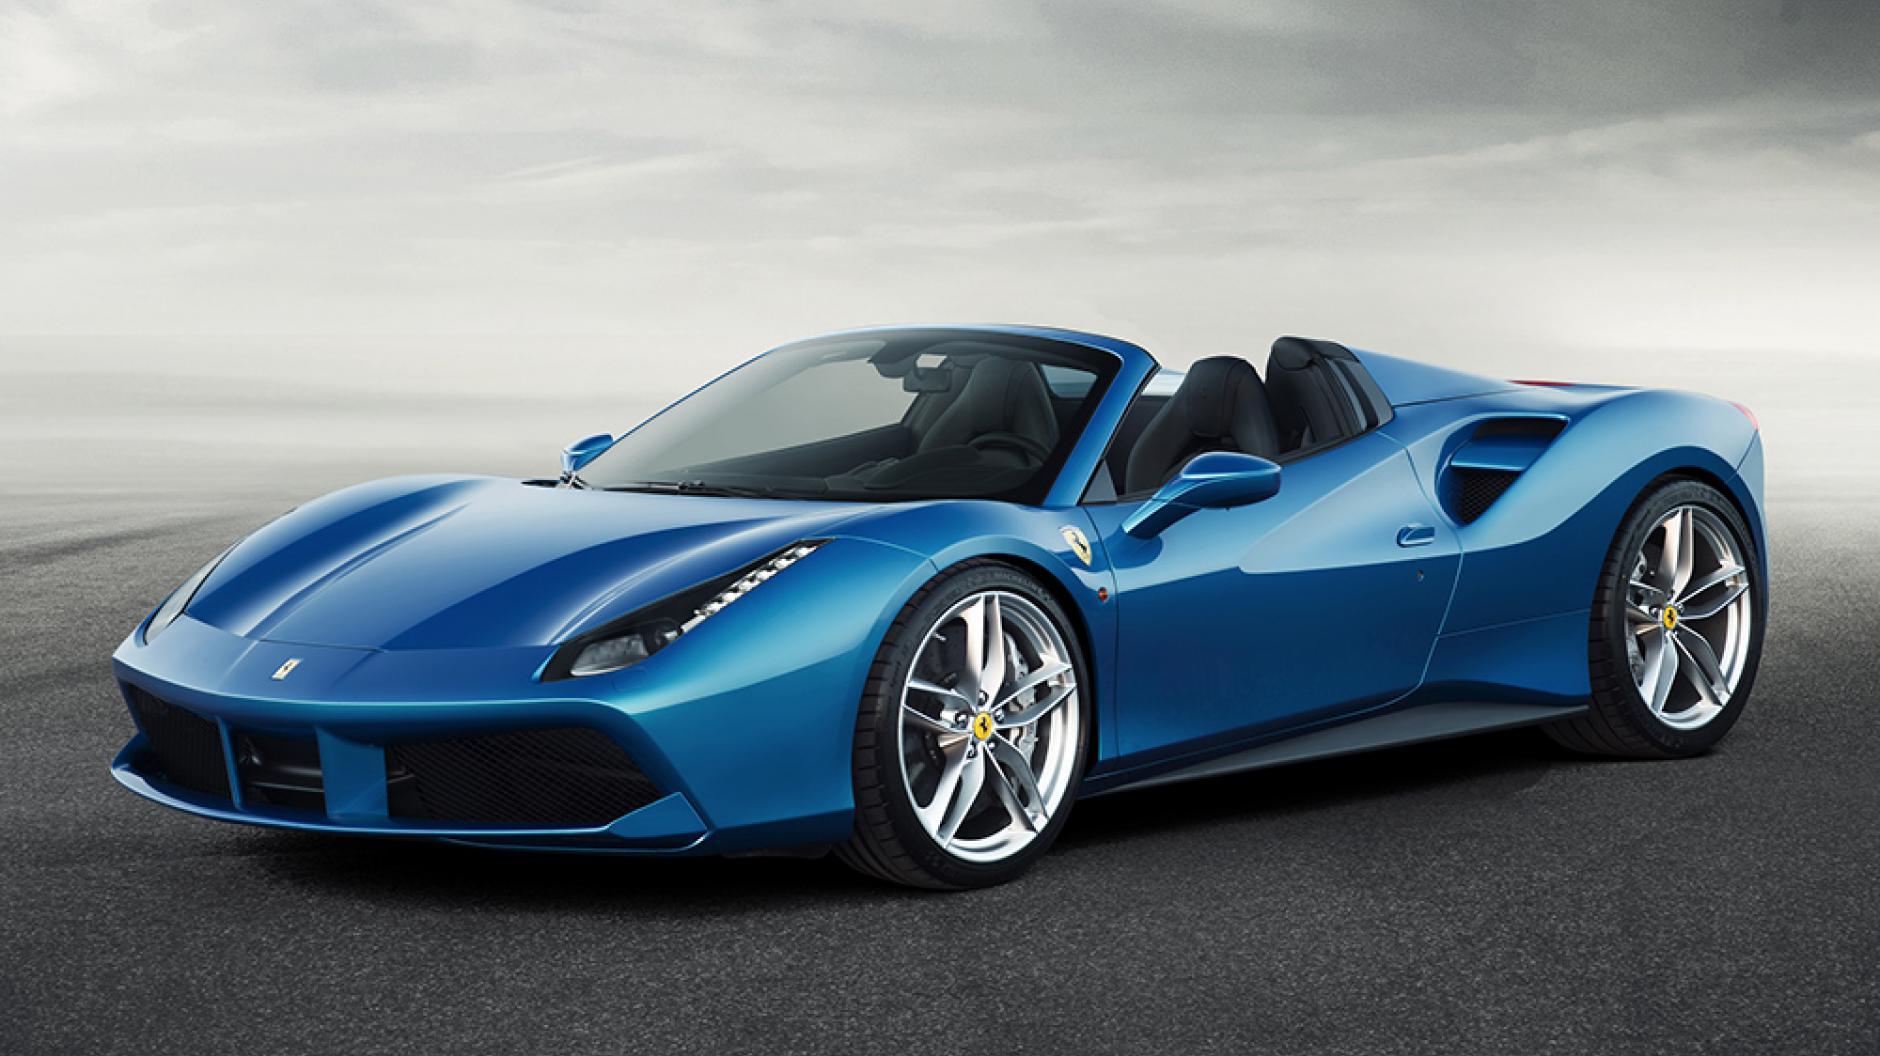 stat attack ferrari 488 spider vs lamborghini huracan spyder - Ferrari 488 Vs Lamborghini Huracan